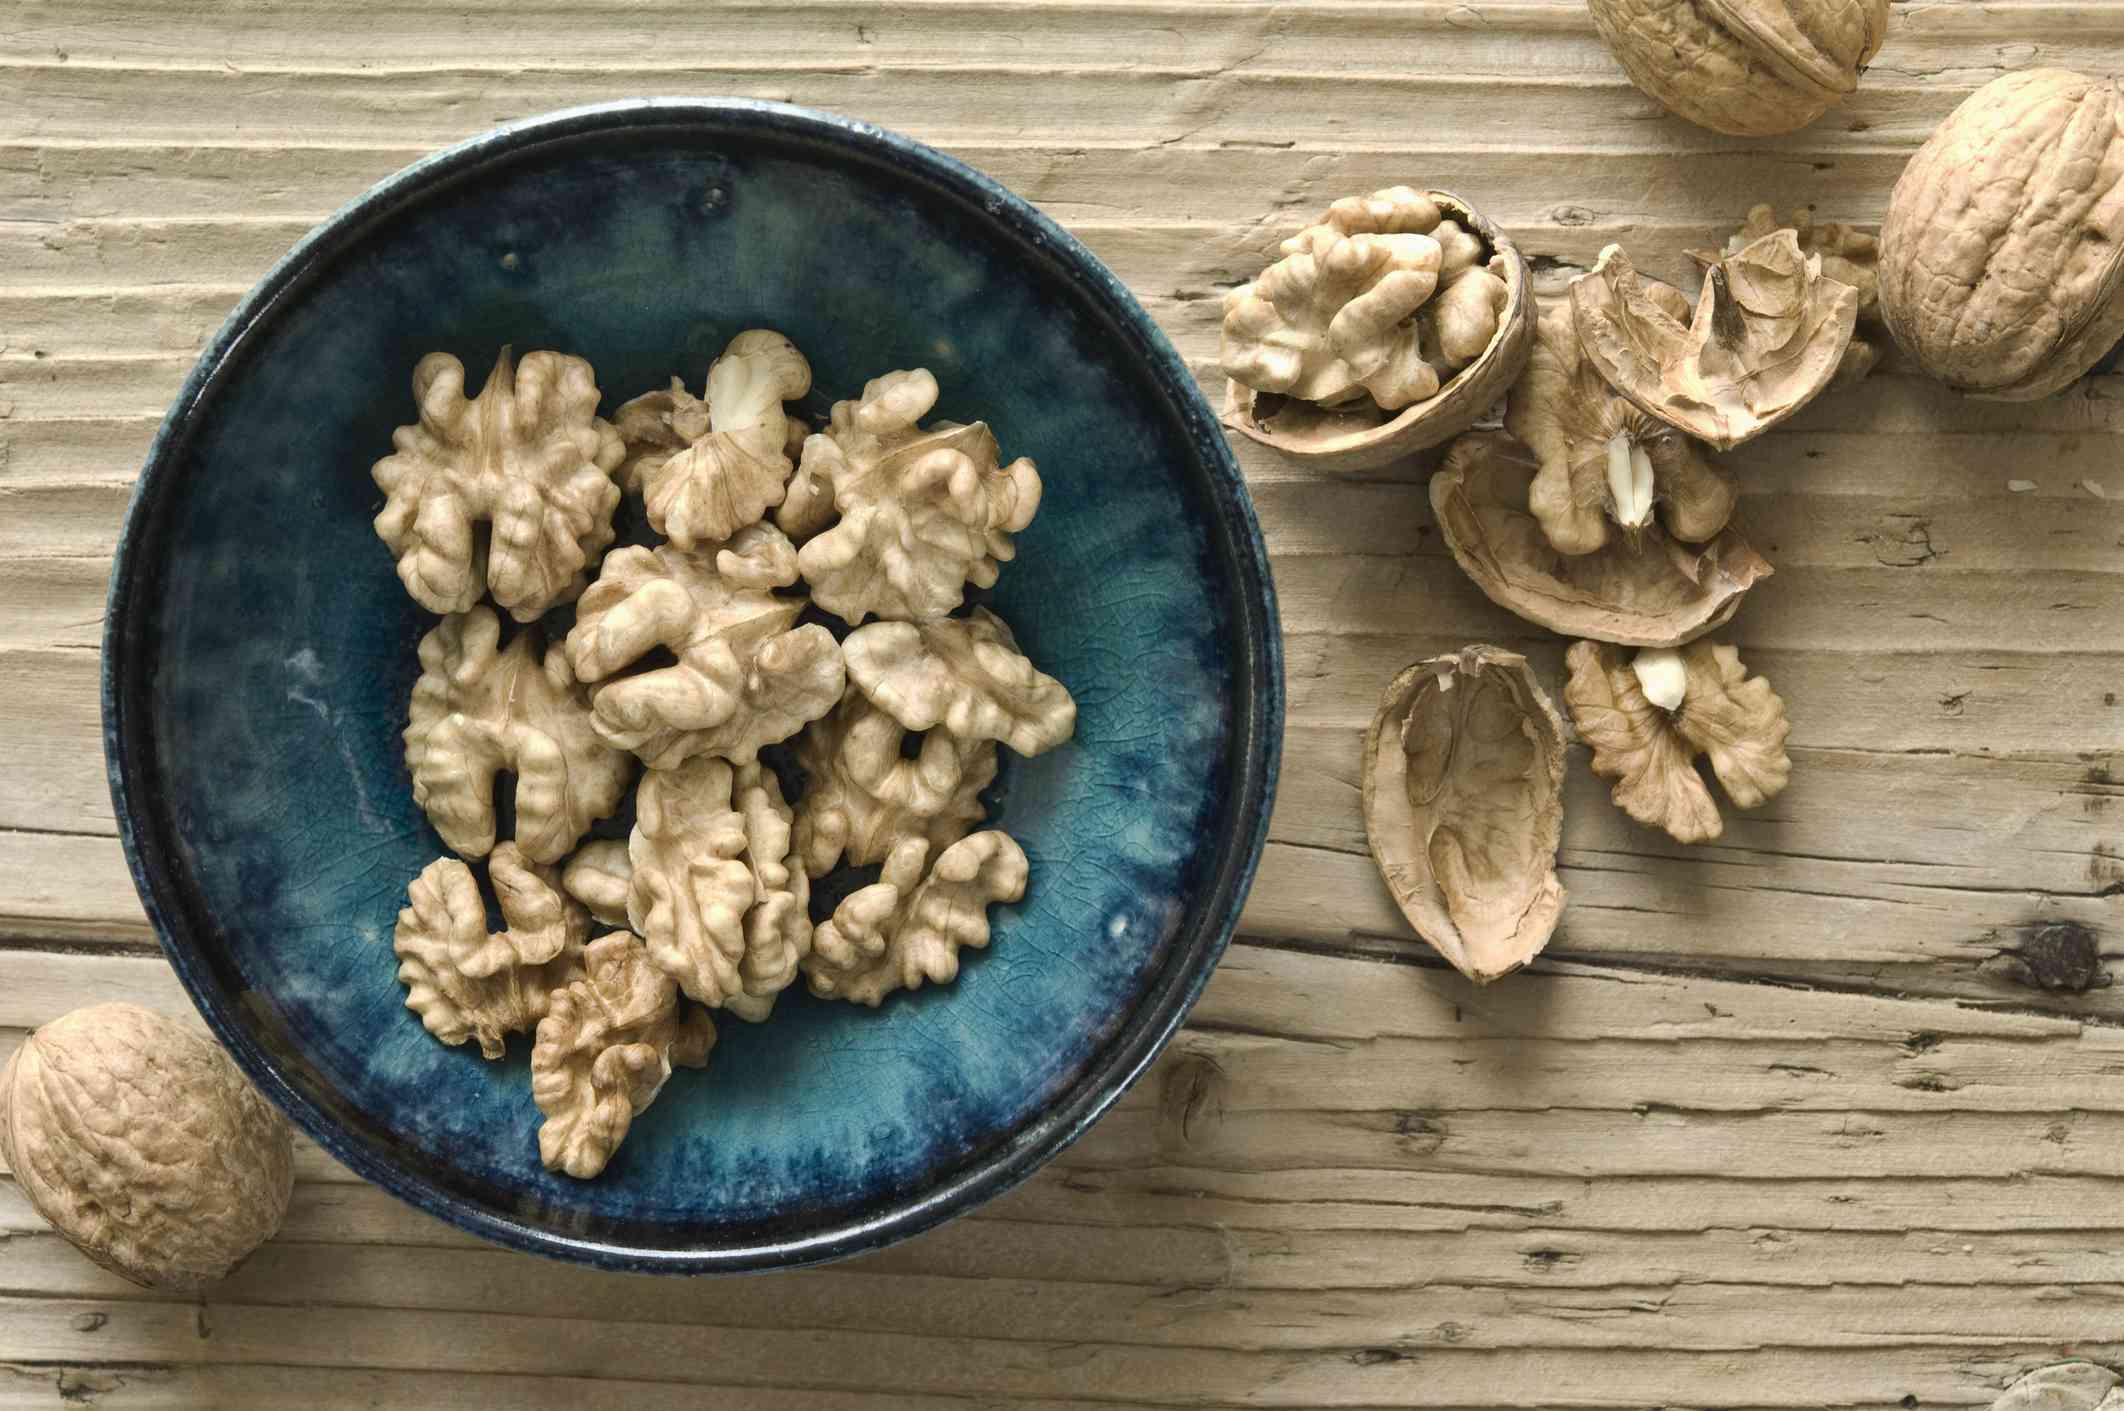 A teal bowl full of walnut halves.